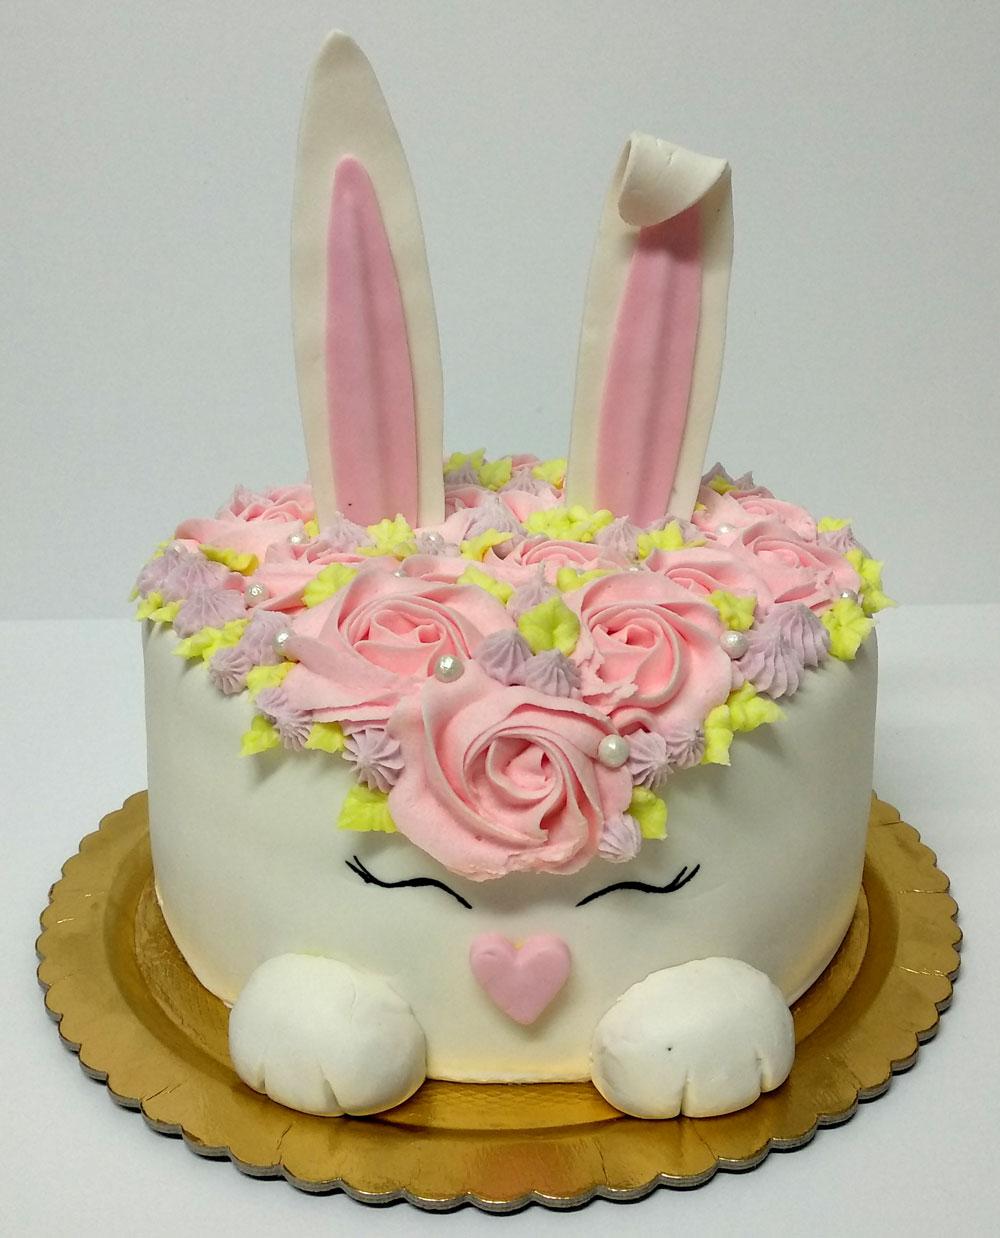 Superb Fantasy Animal Cakes Kosher Cakery Kosher Cakes Gift Personalised Birthday Cards Paralily Jamesorg